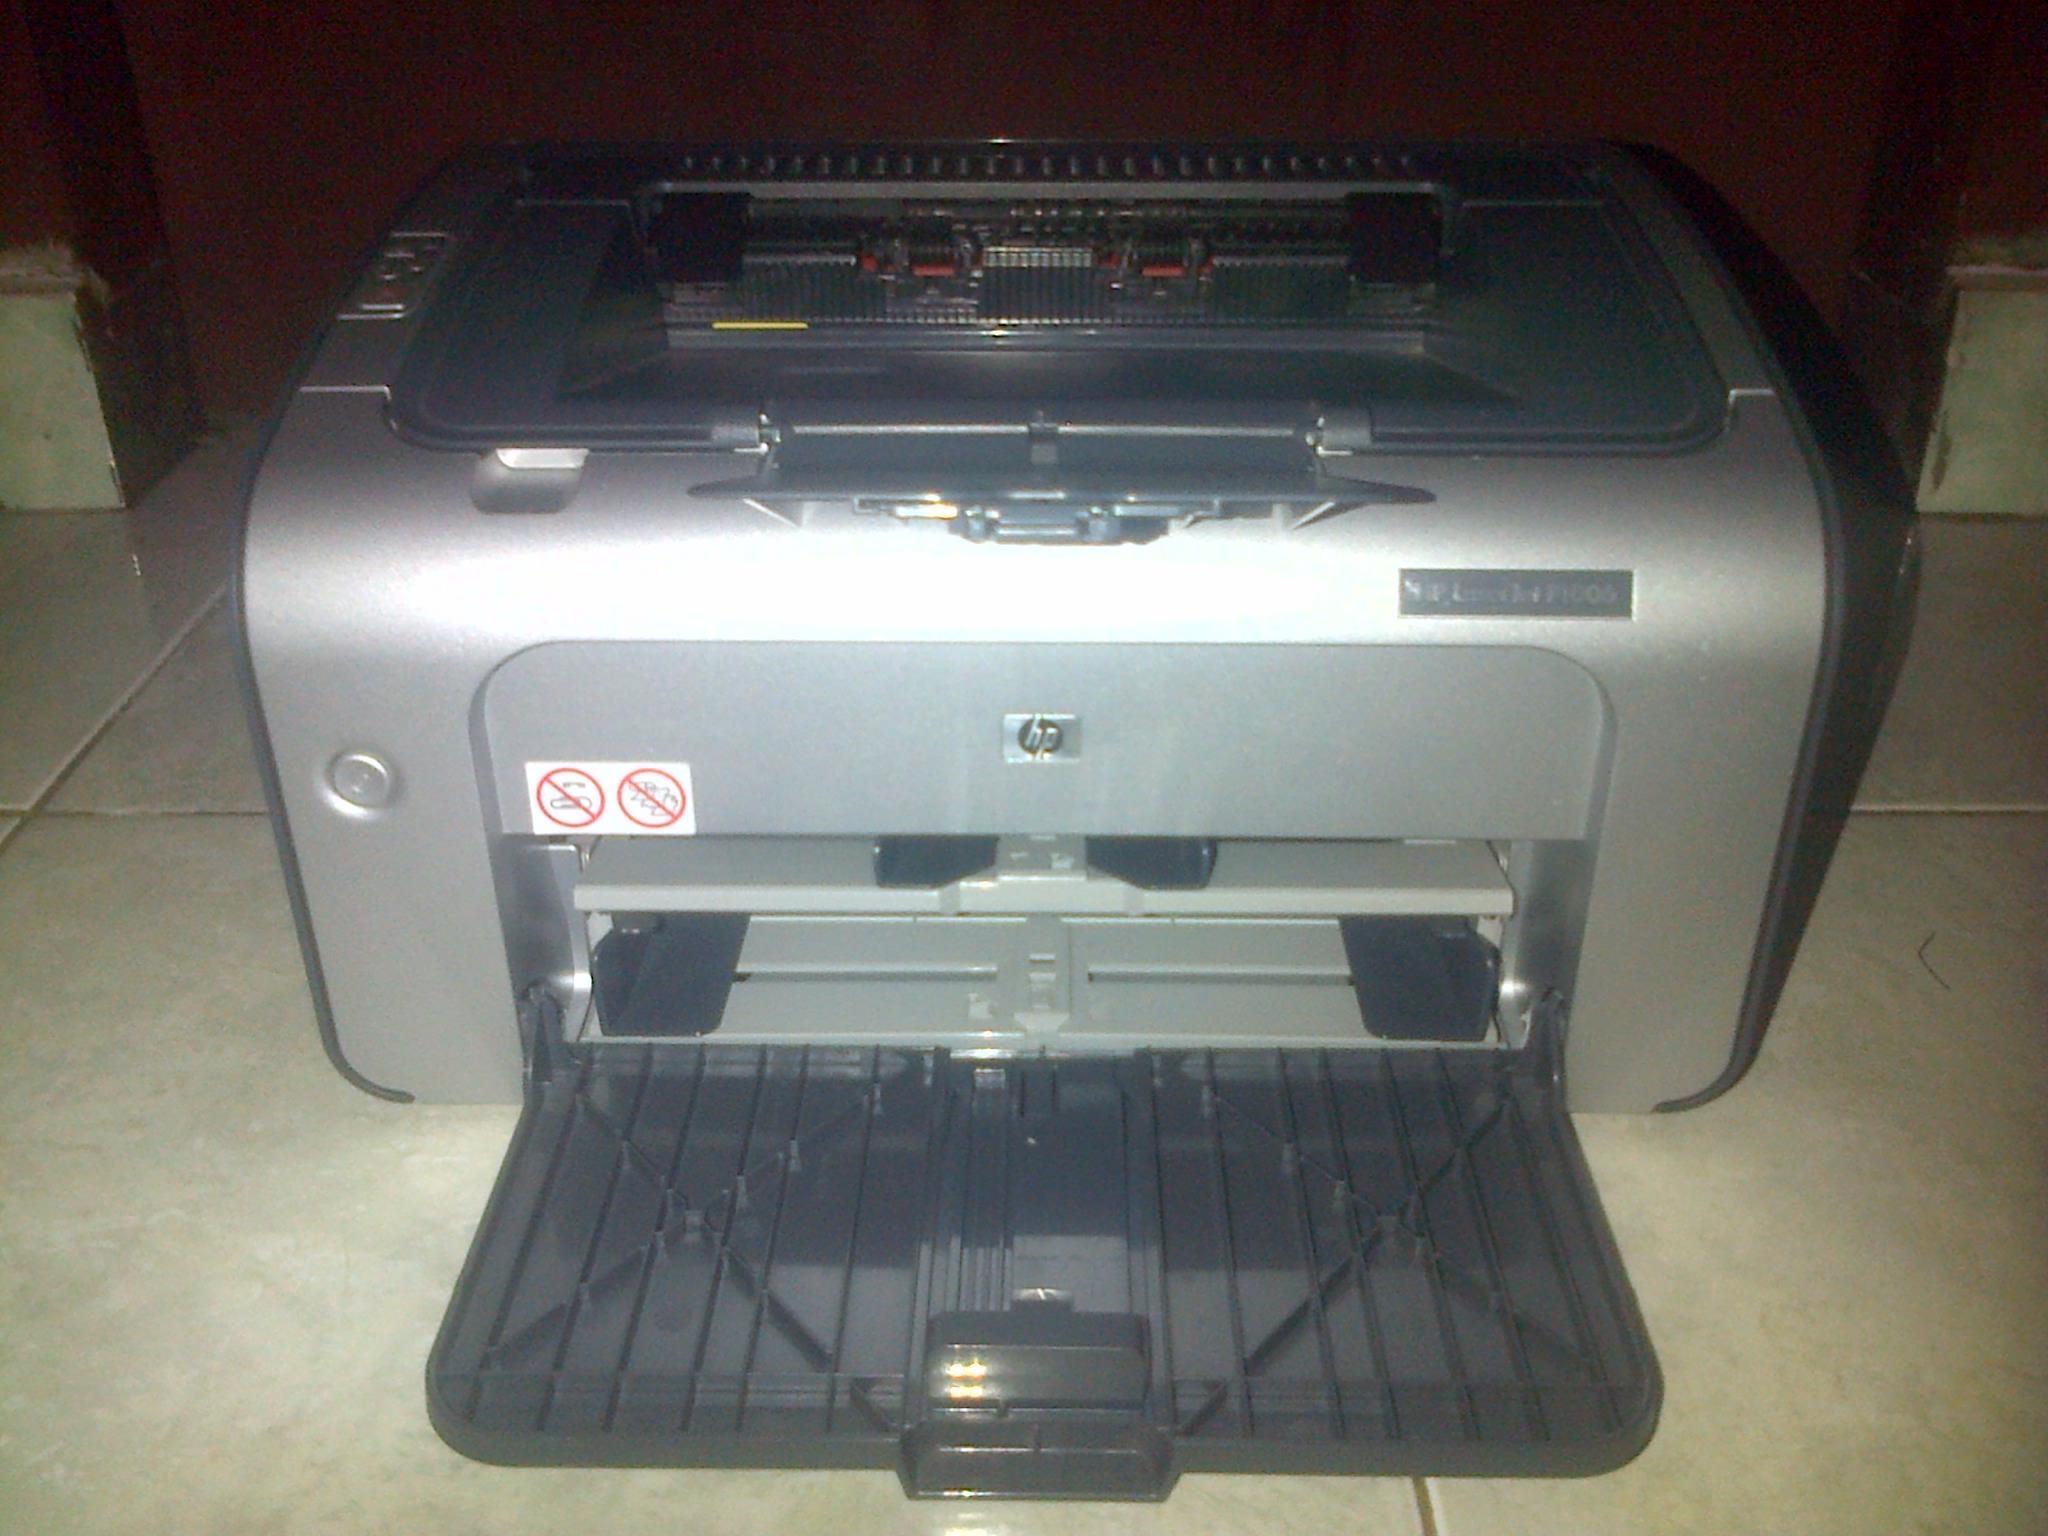 jual printer hp laserjet p1006 harga murah jakarta oleh mahajaya toner. Black Bedroom Furniture Sets. Home Design Ideas